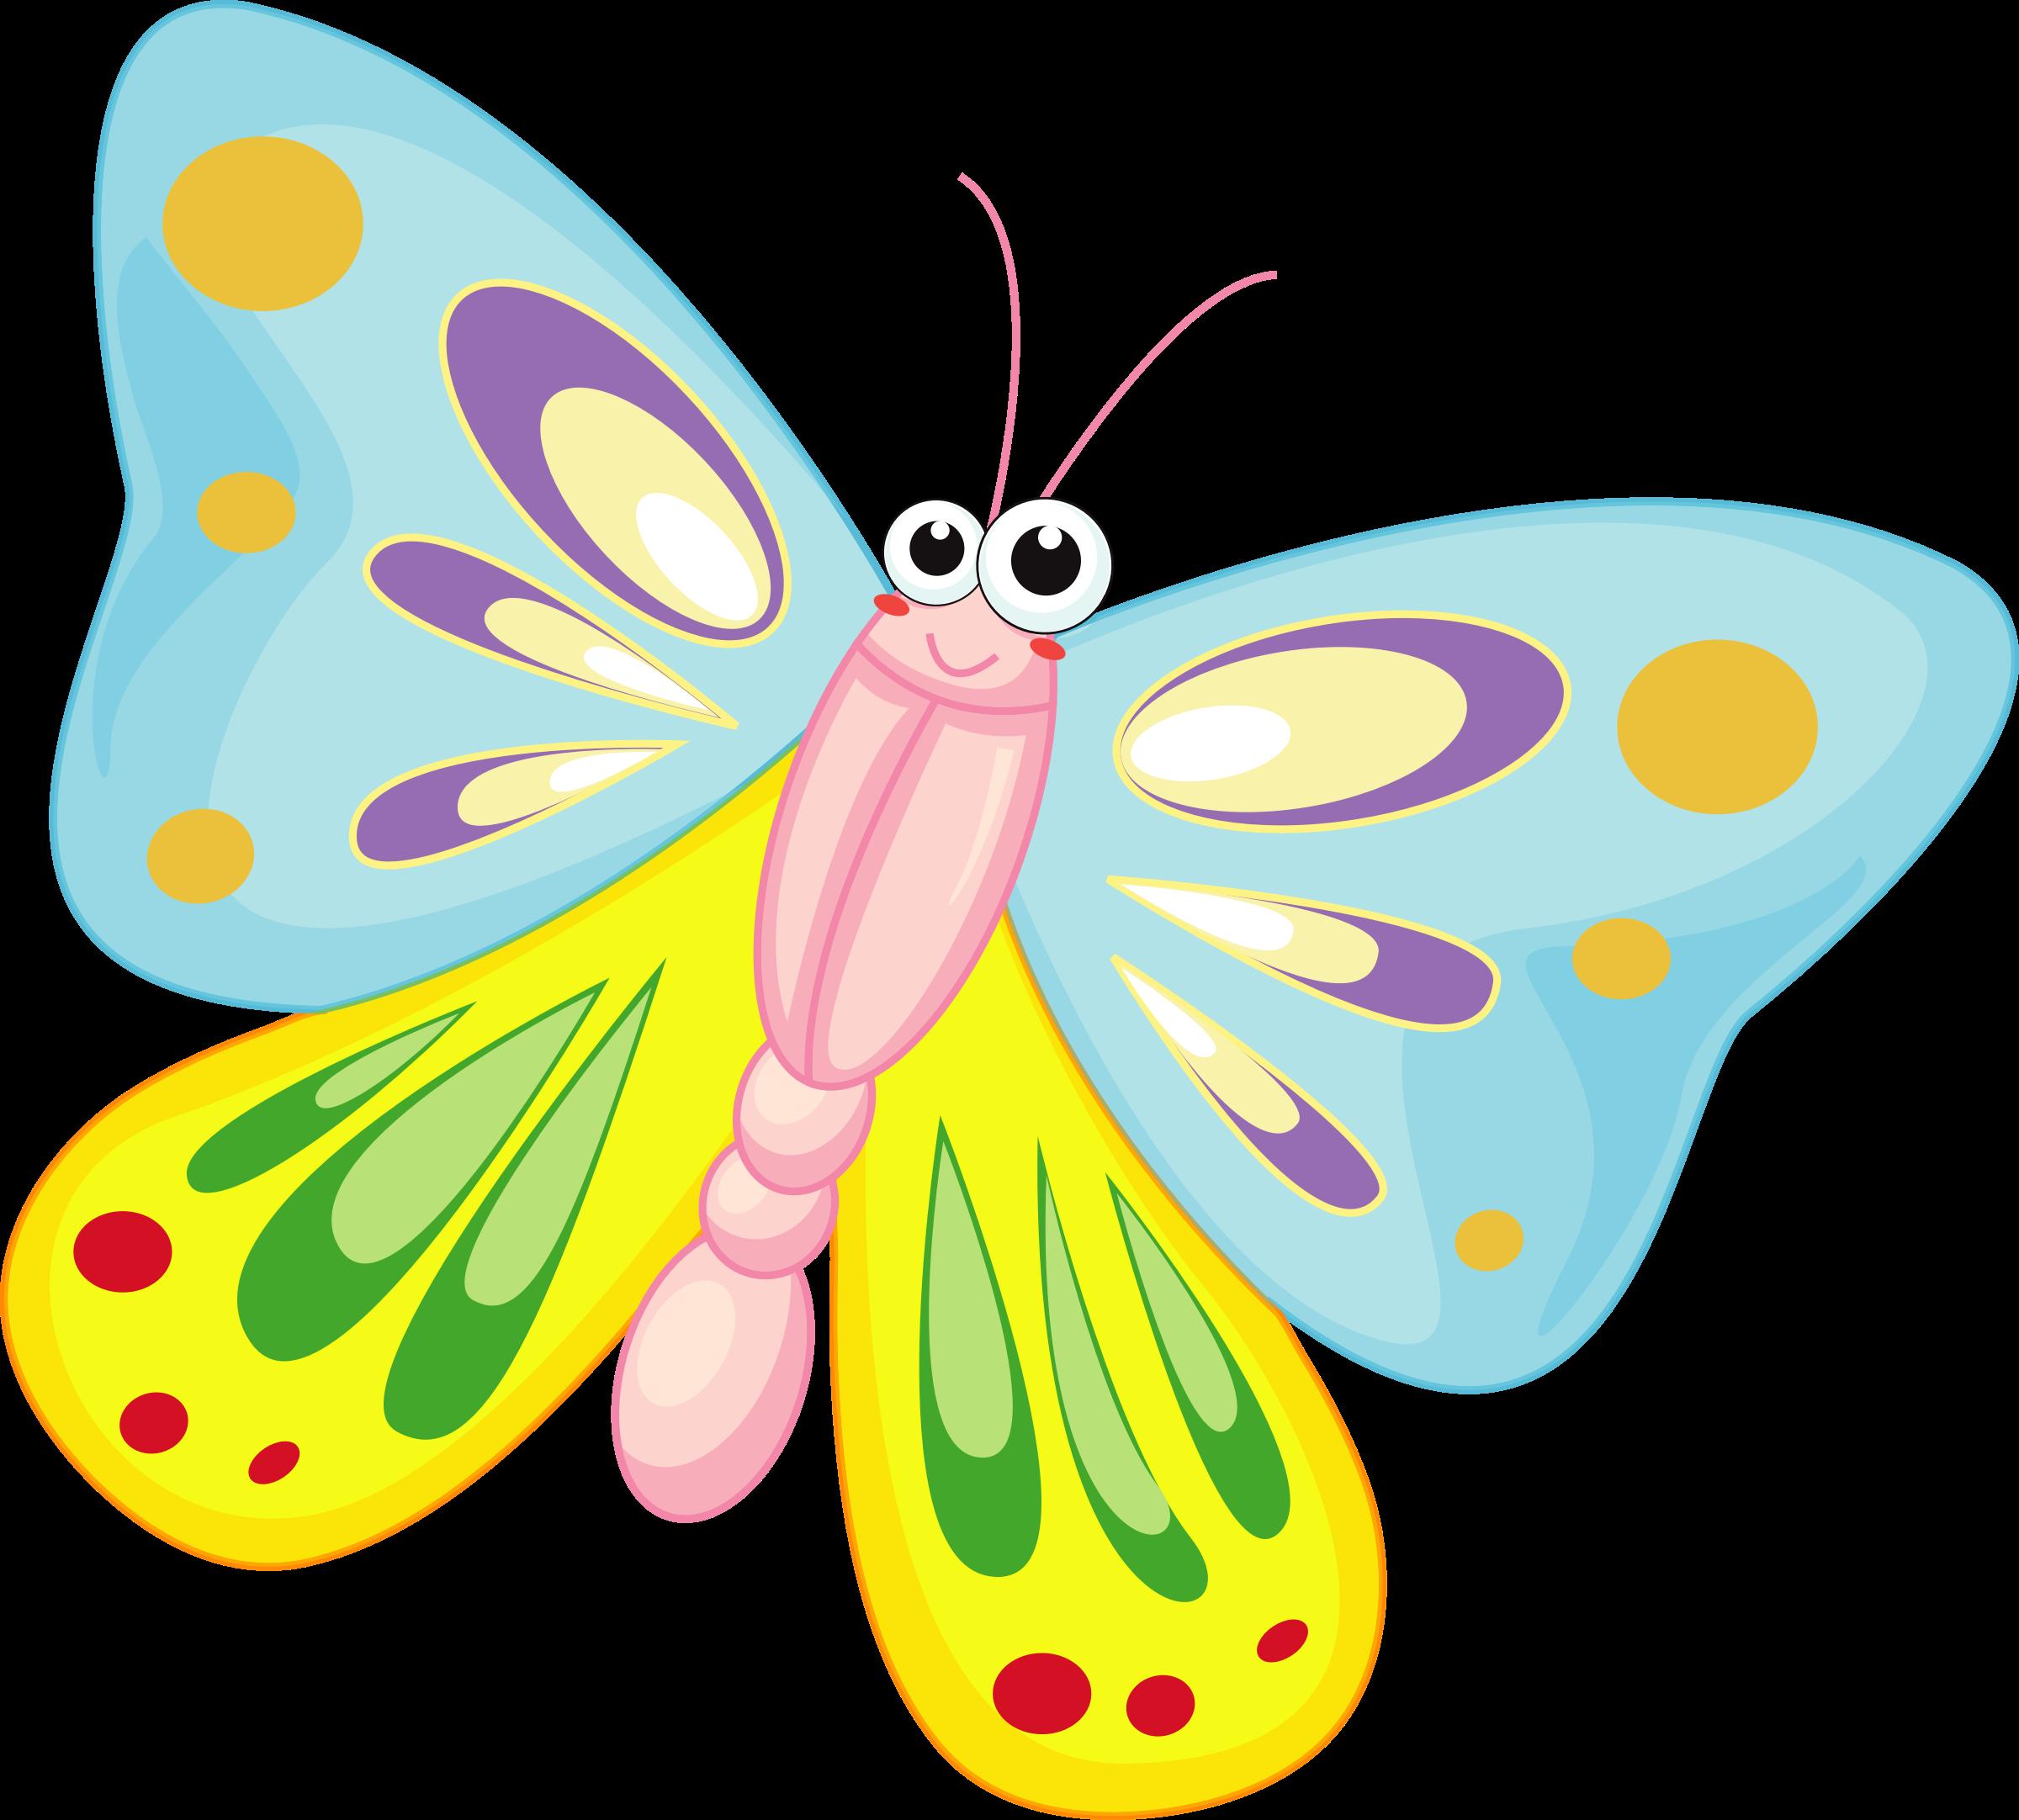 vector download Butterflies clipart cartoon. Butterfly big image png.